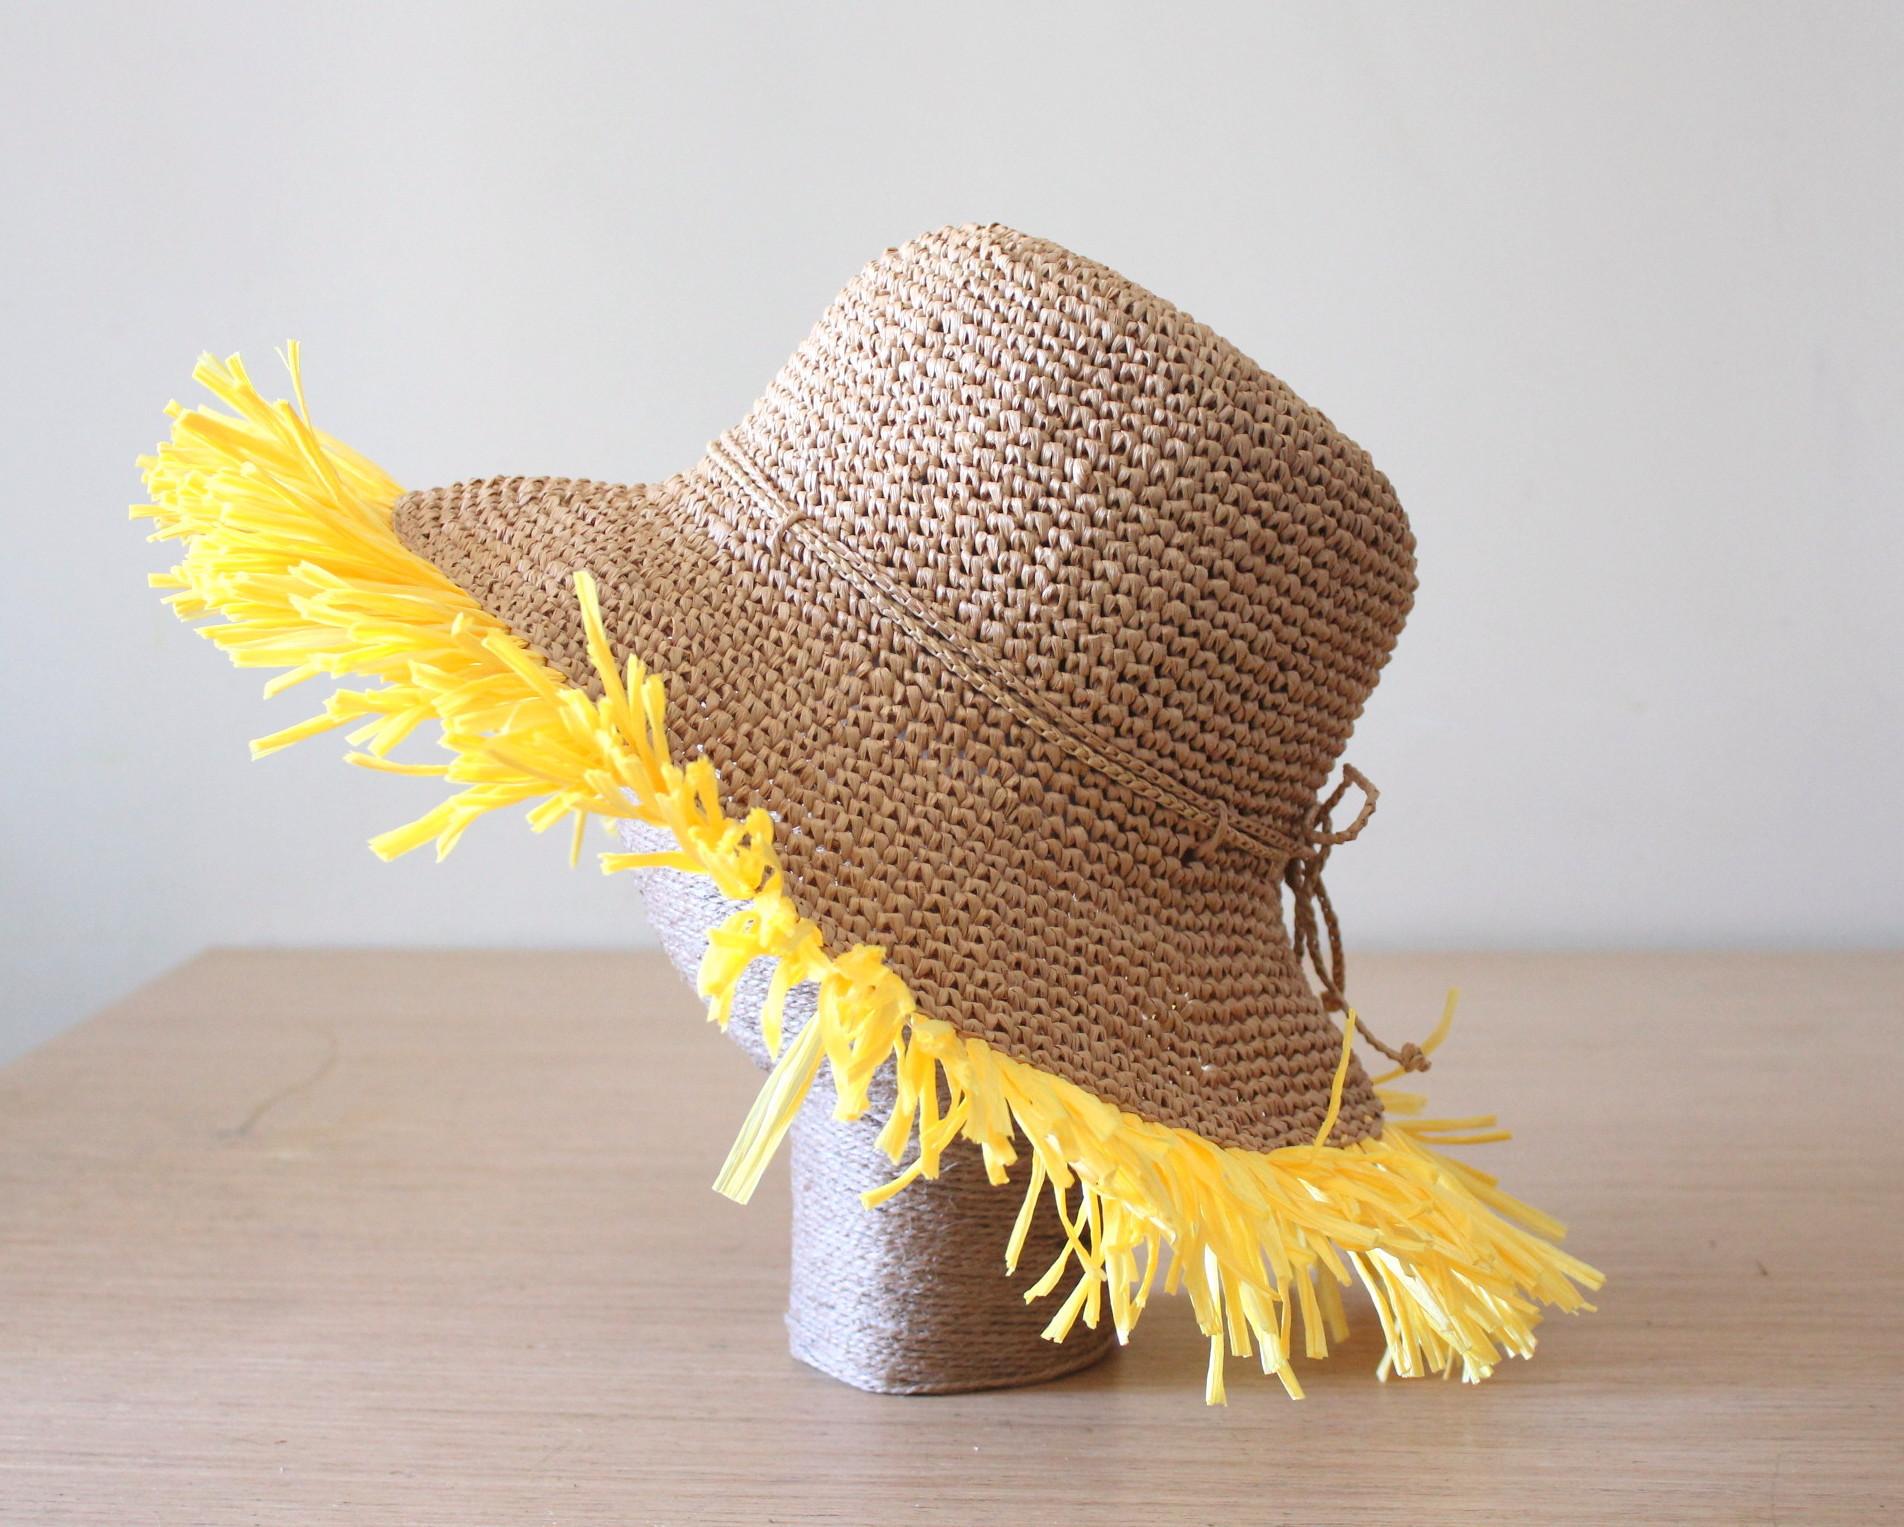 hat sun hat raffia hat fringes straw sun hat crochet hat womens hat